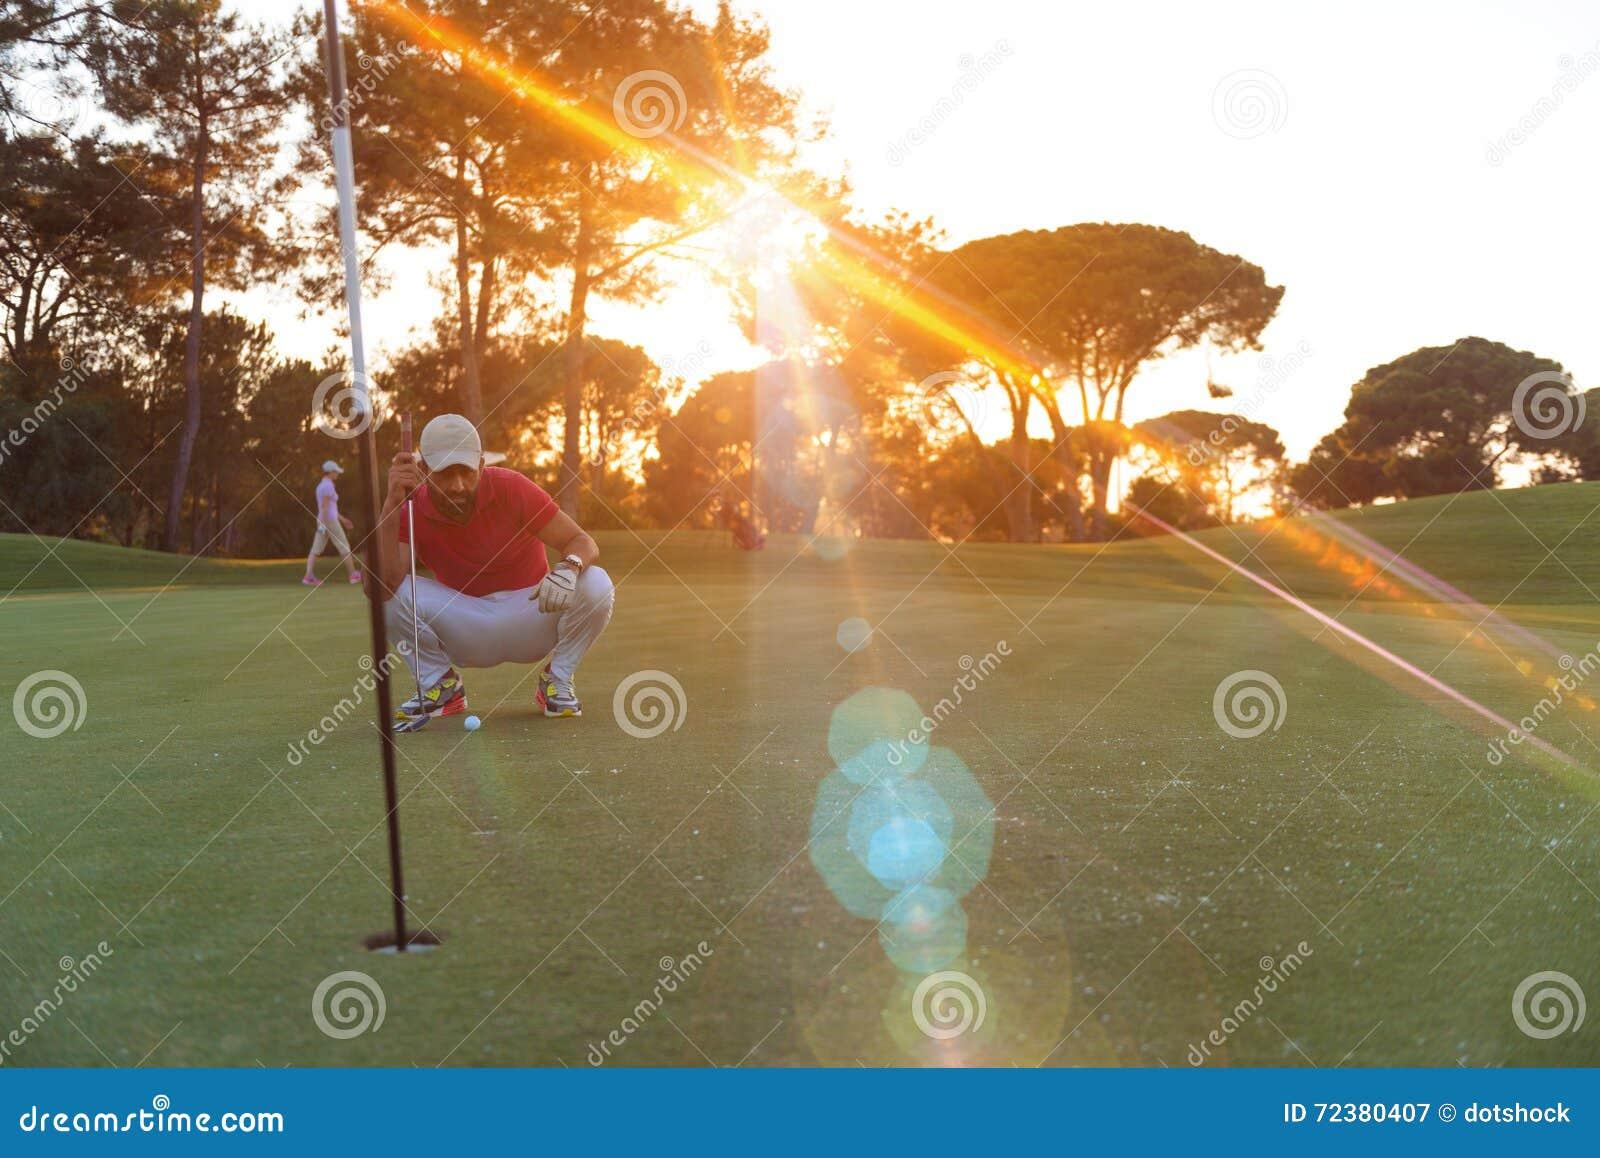 Golf player aiming perfect shot on beautiful sunset